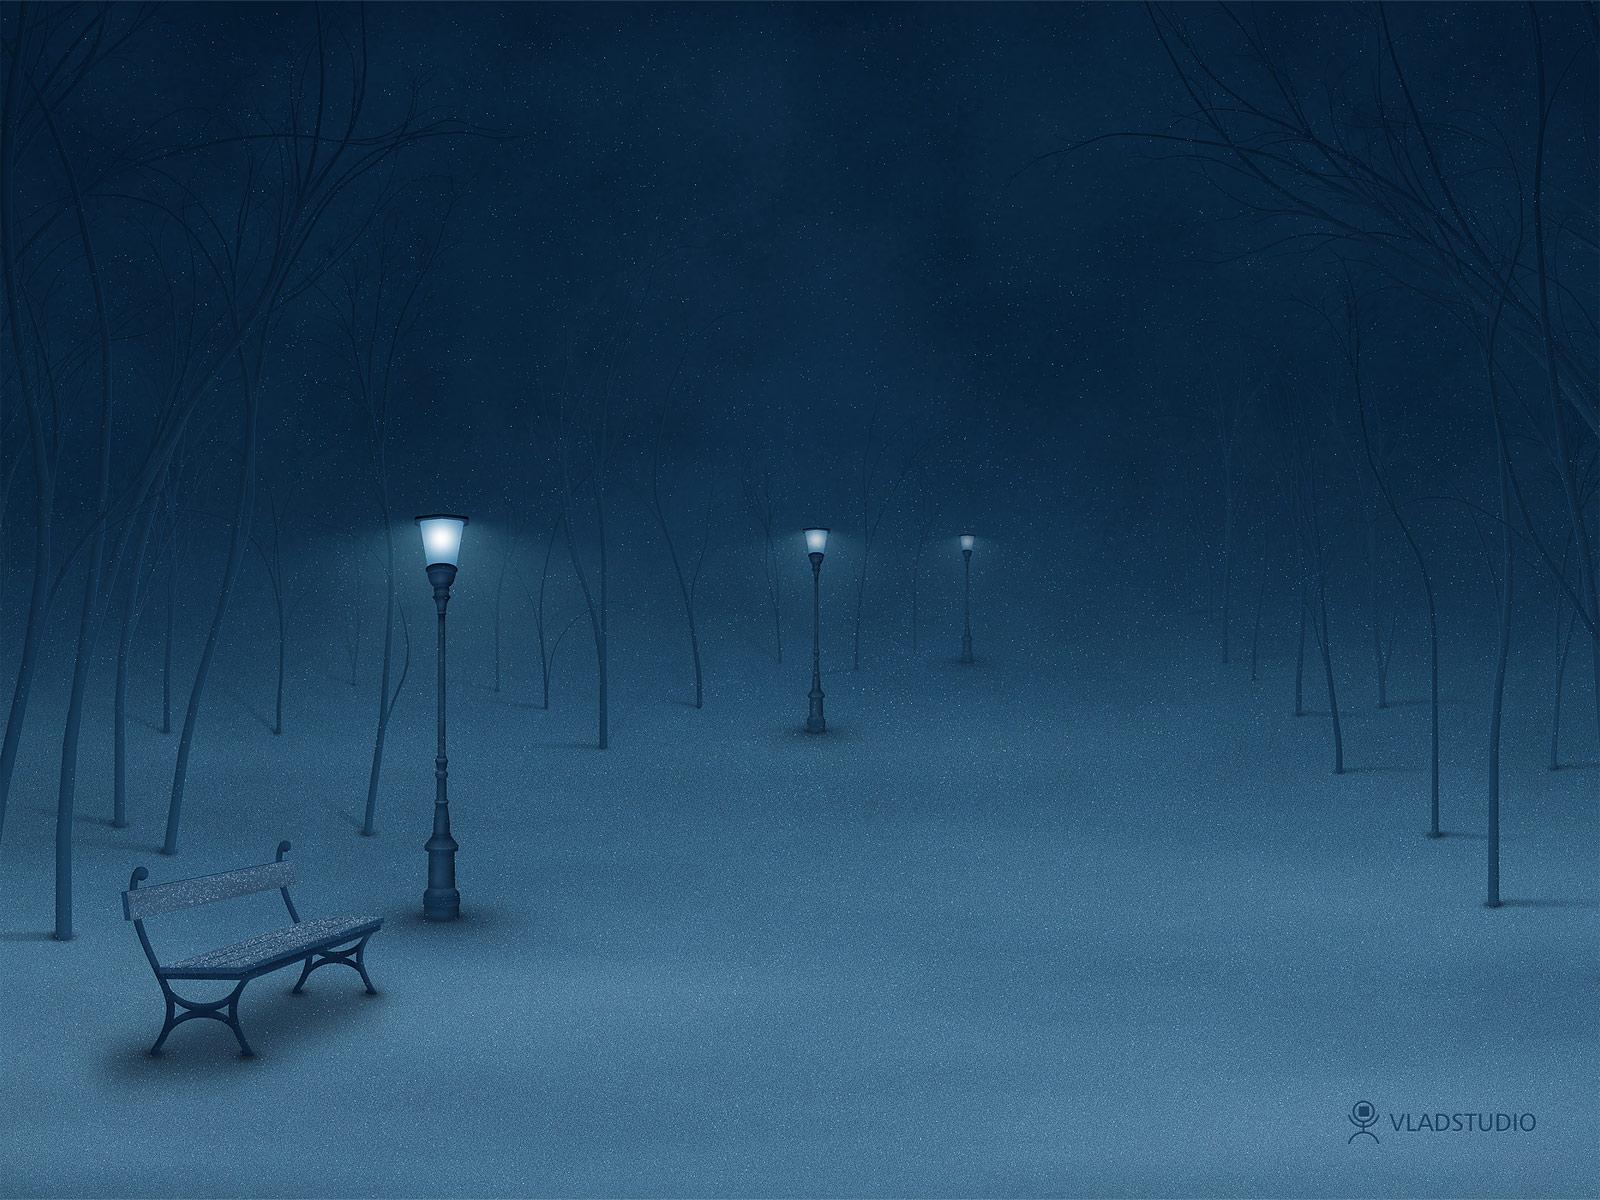 Night Winter Mountain Scenes HD Walls Find Wallpapers 1600x1200